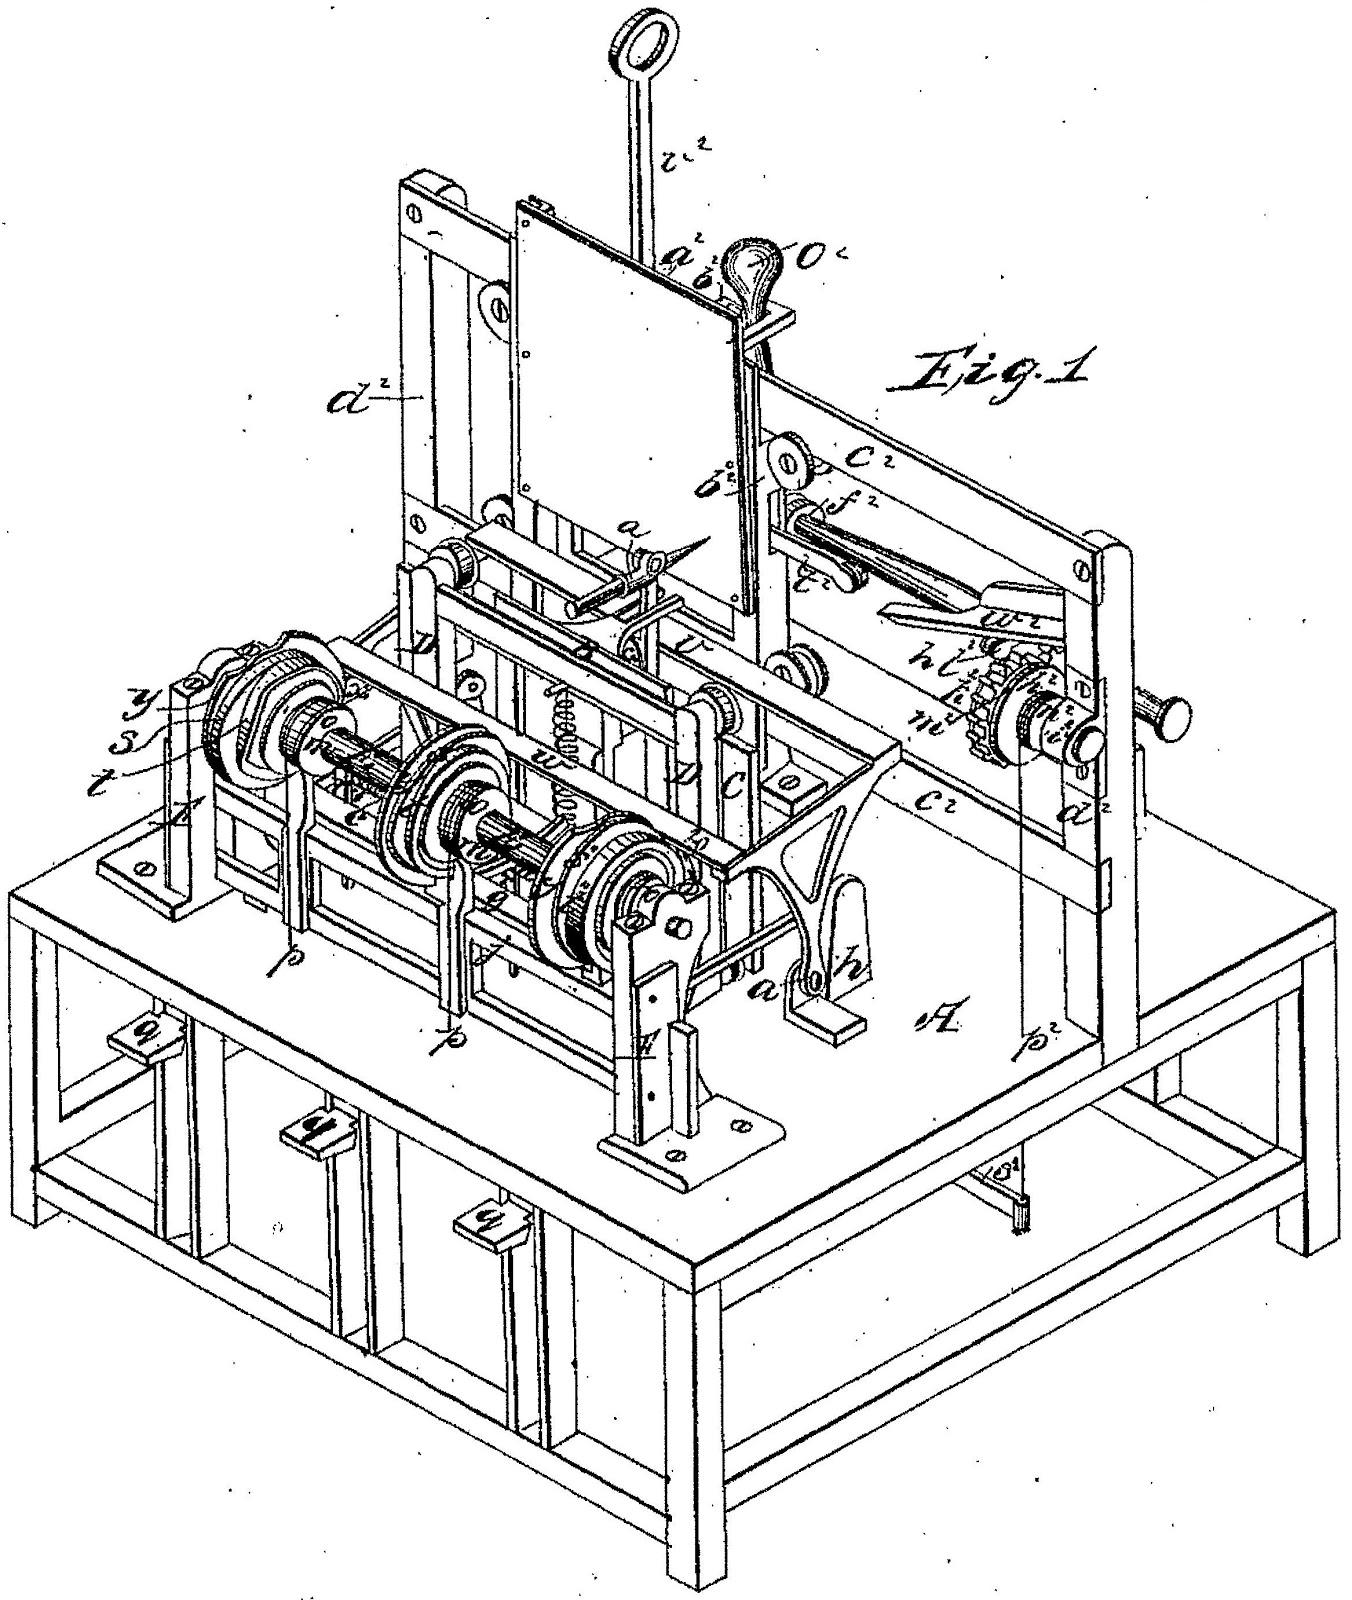 oz.Typewriter: On This Day in Typewriter History: The True